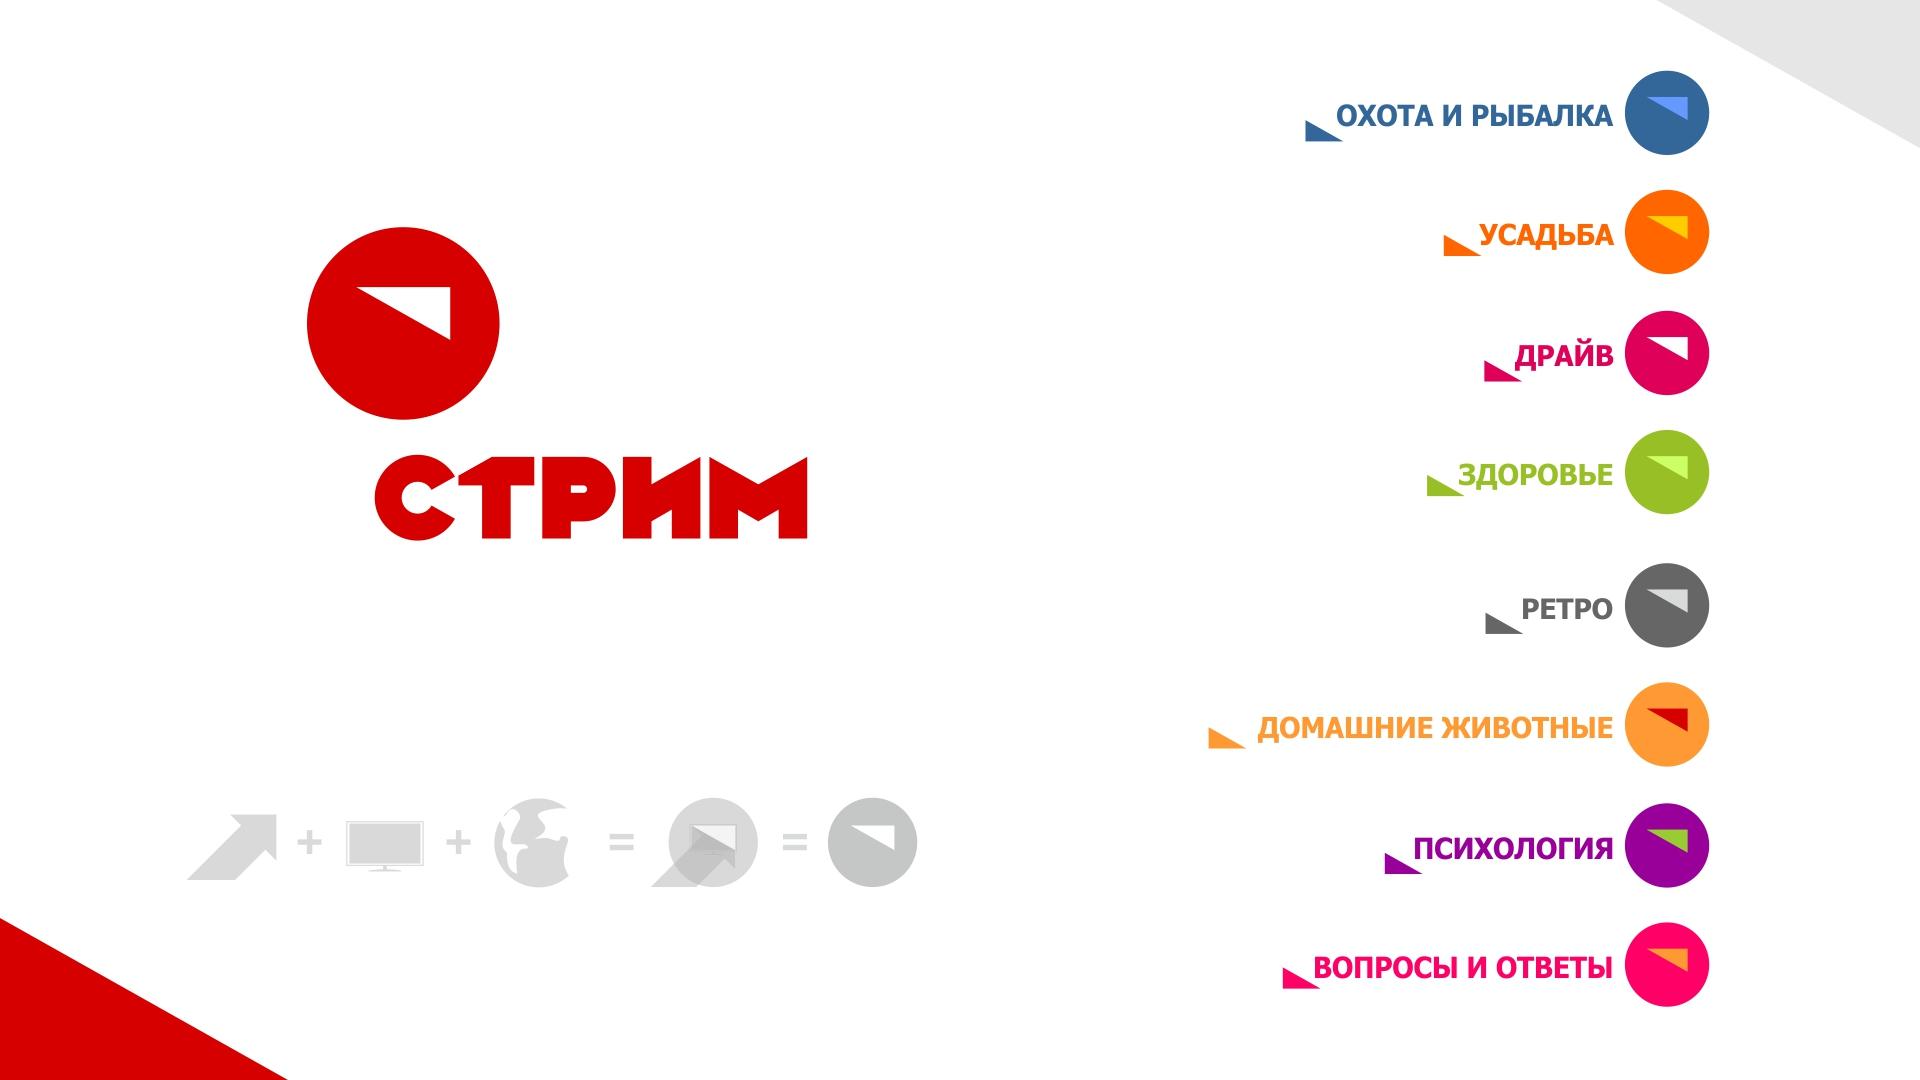 Создание концепции заставки и логотипа (телеканал) фото f_039566ea234bb0bf.jpg